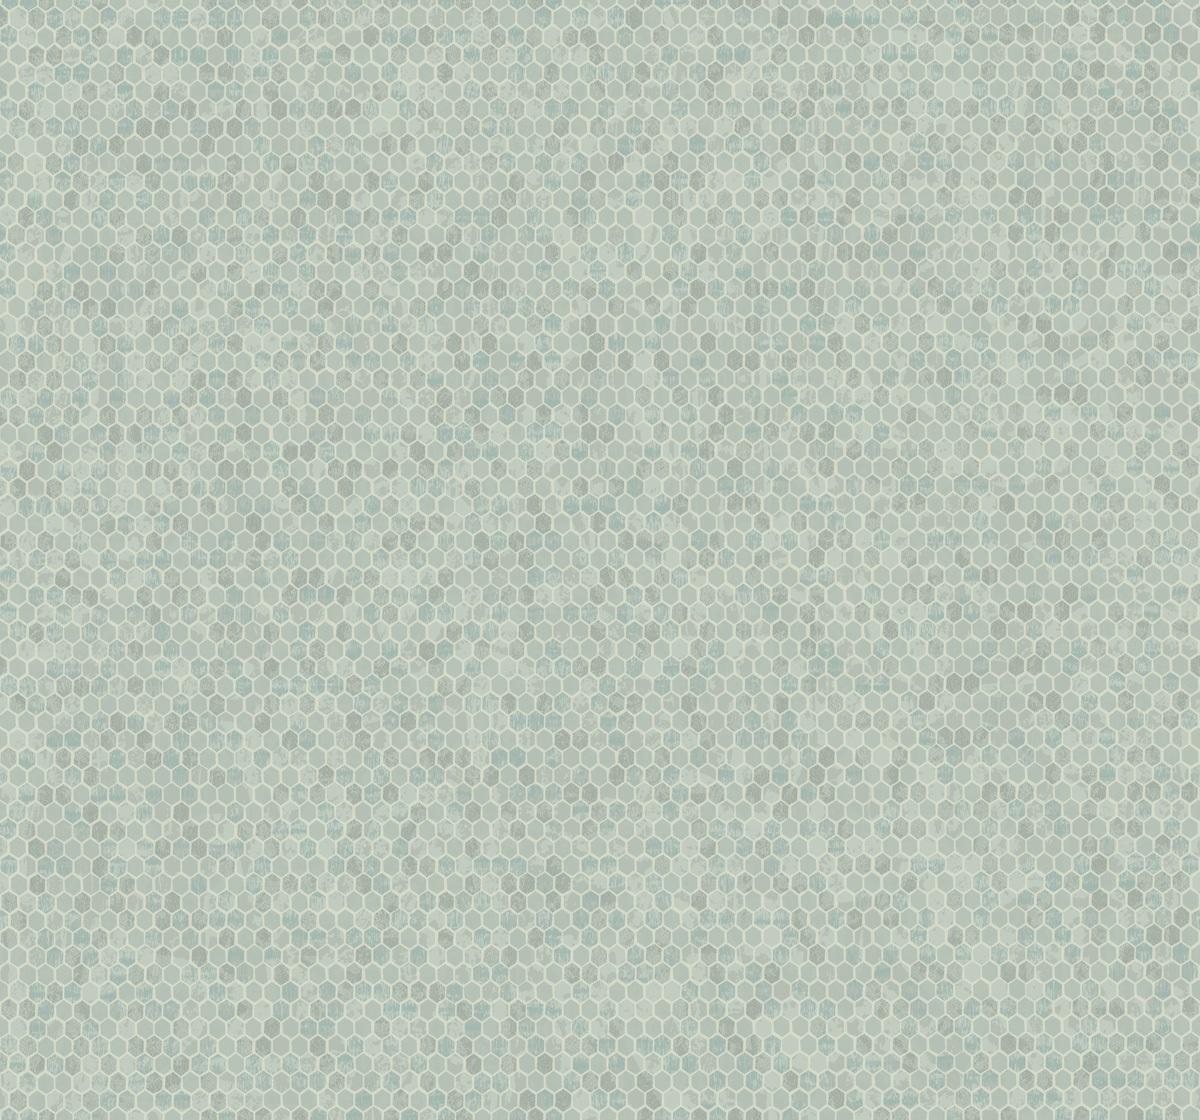 Обои Wallquest Gatsby GA30104, интернет магазин Волео